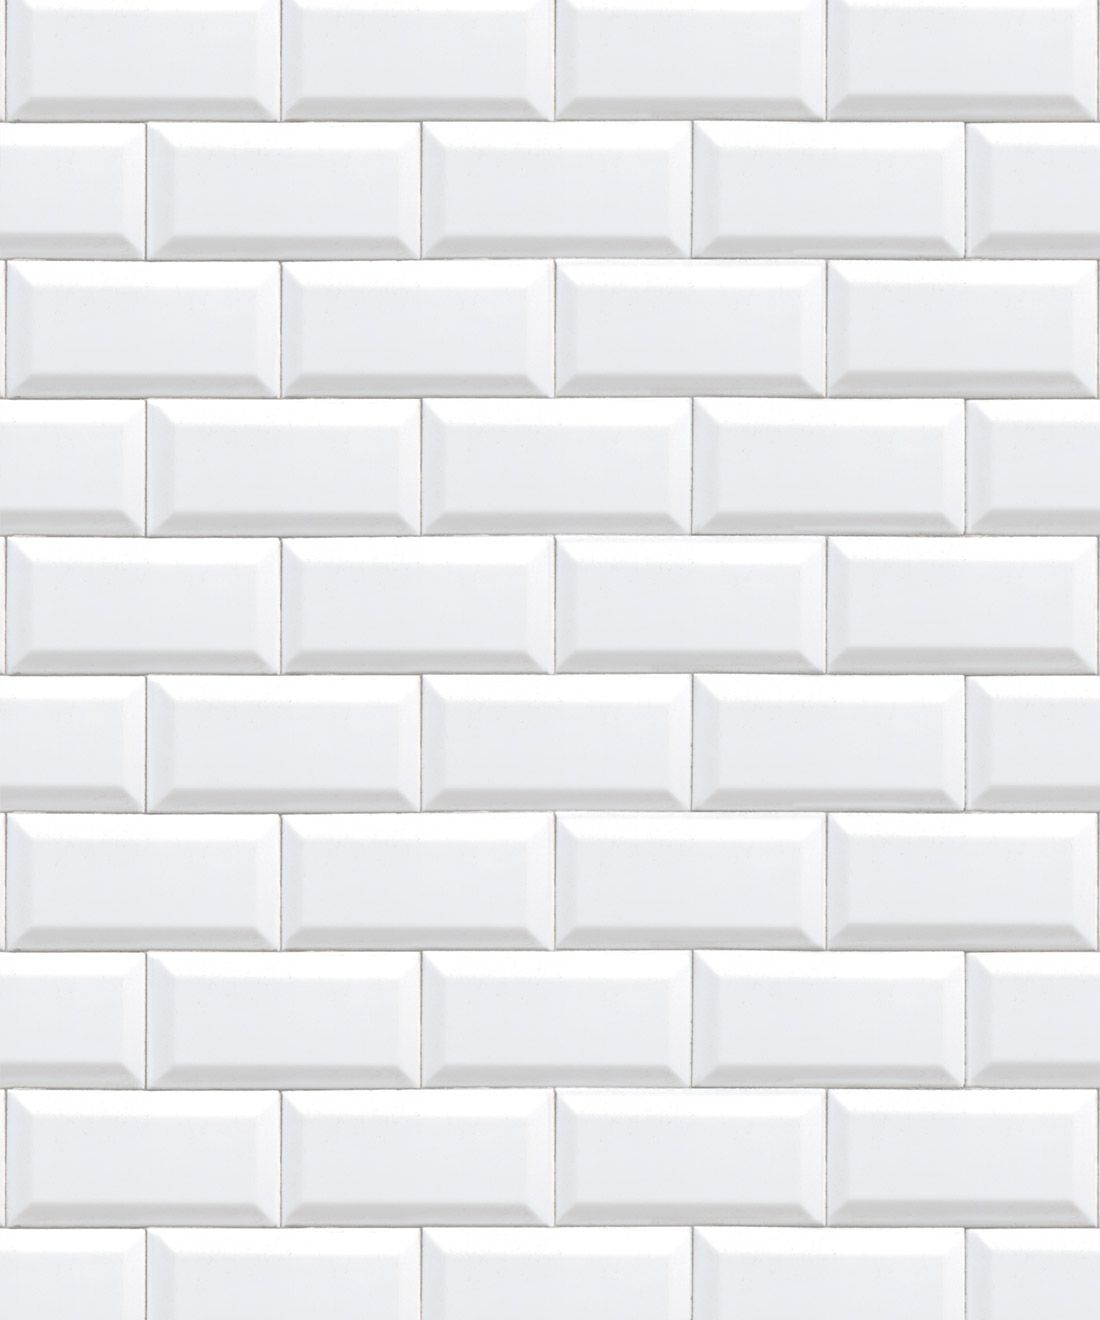 White Subway Tiles Wallpaper Minimal Wallpaper Milton King In 2021 White Subway Tiles Tile Wallpaper Bathroom Wallpaper Trends